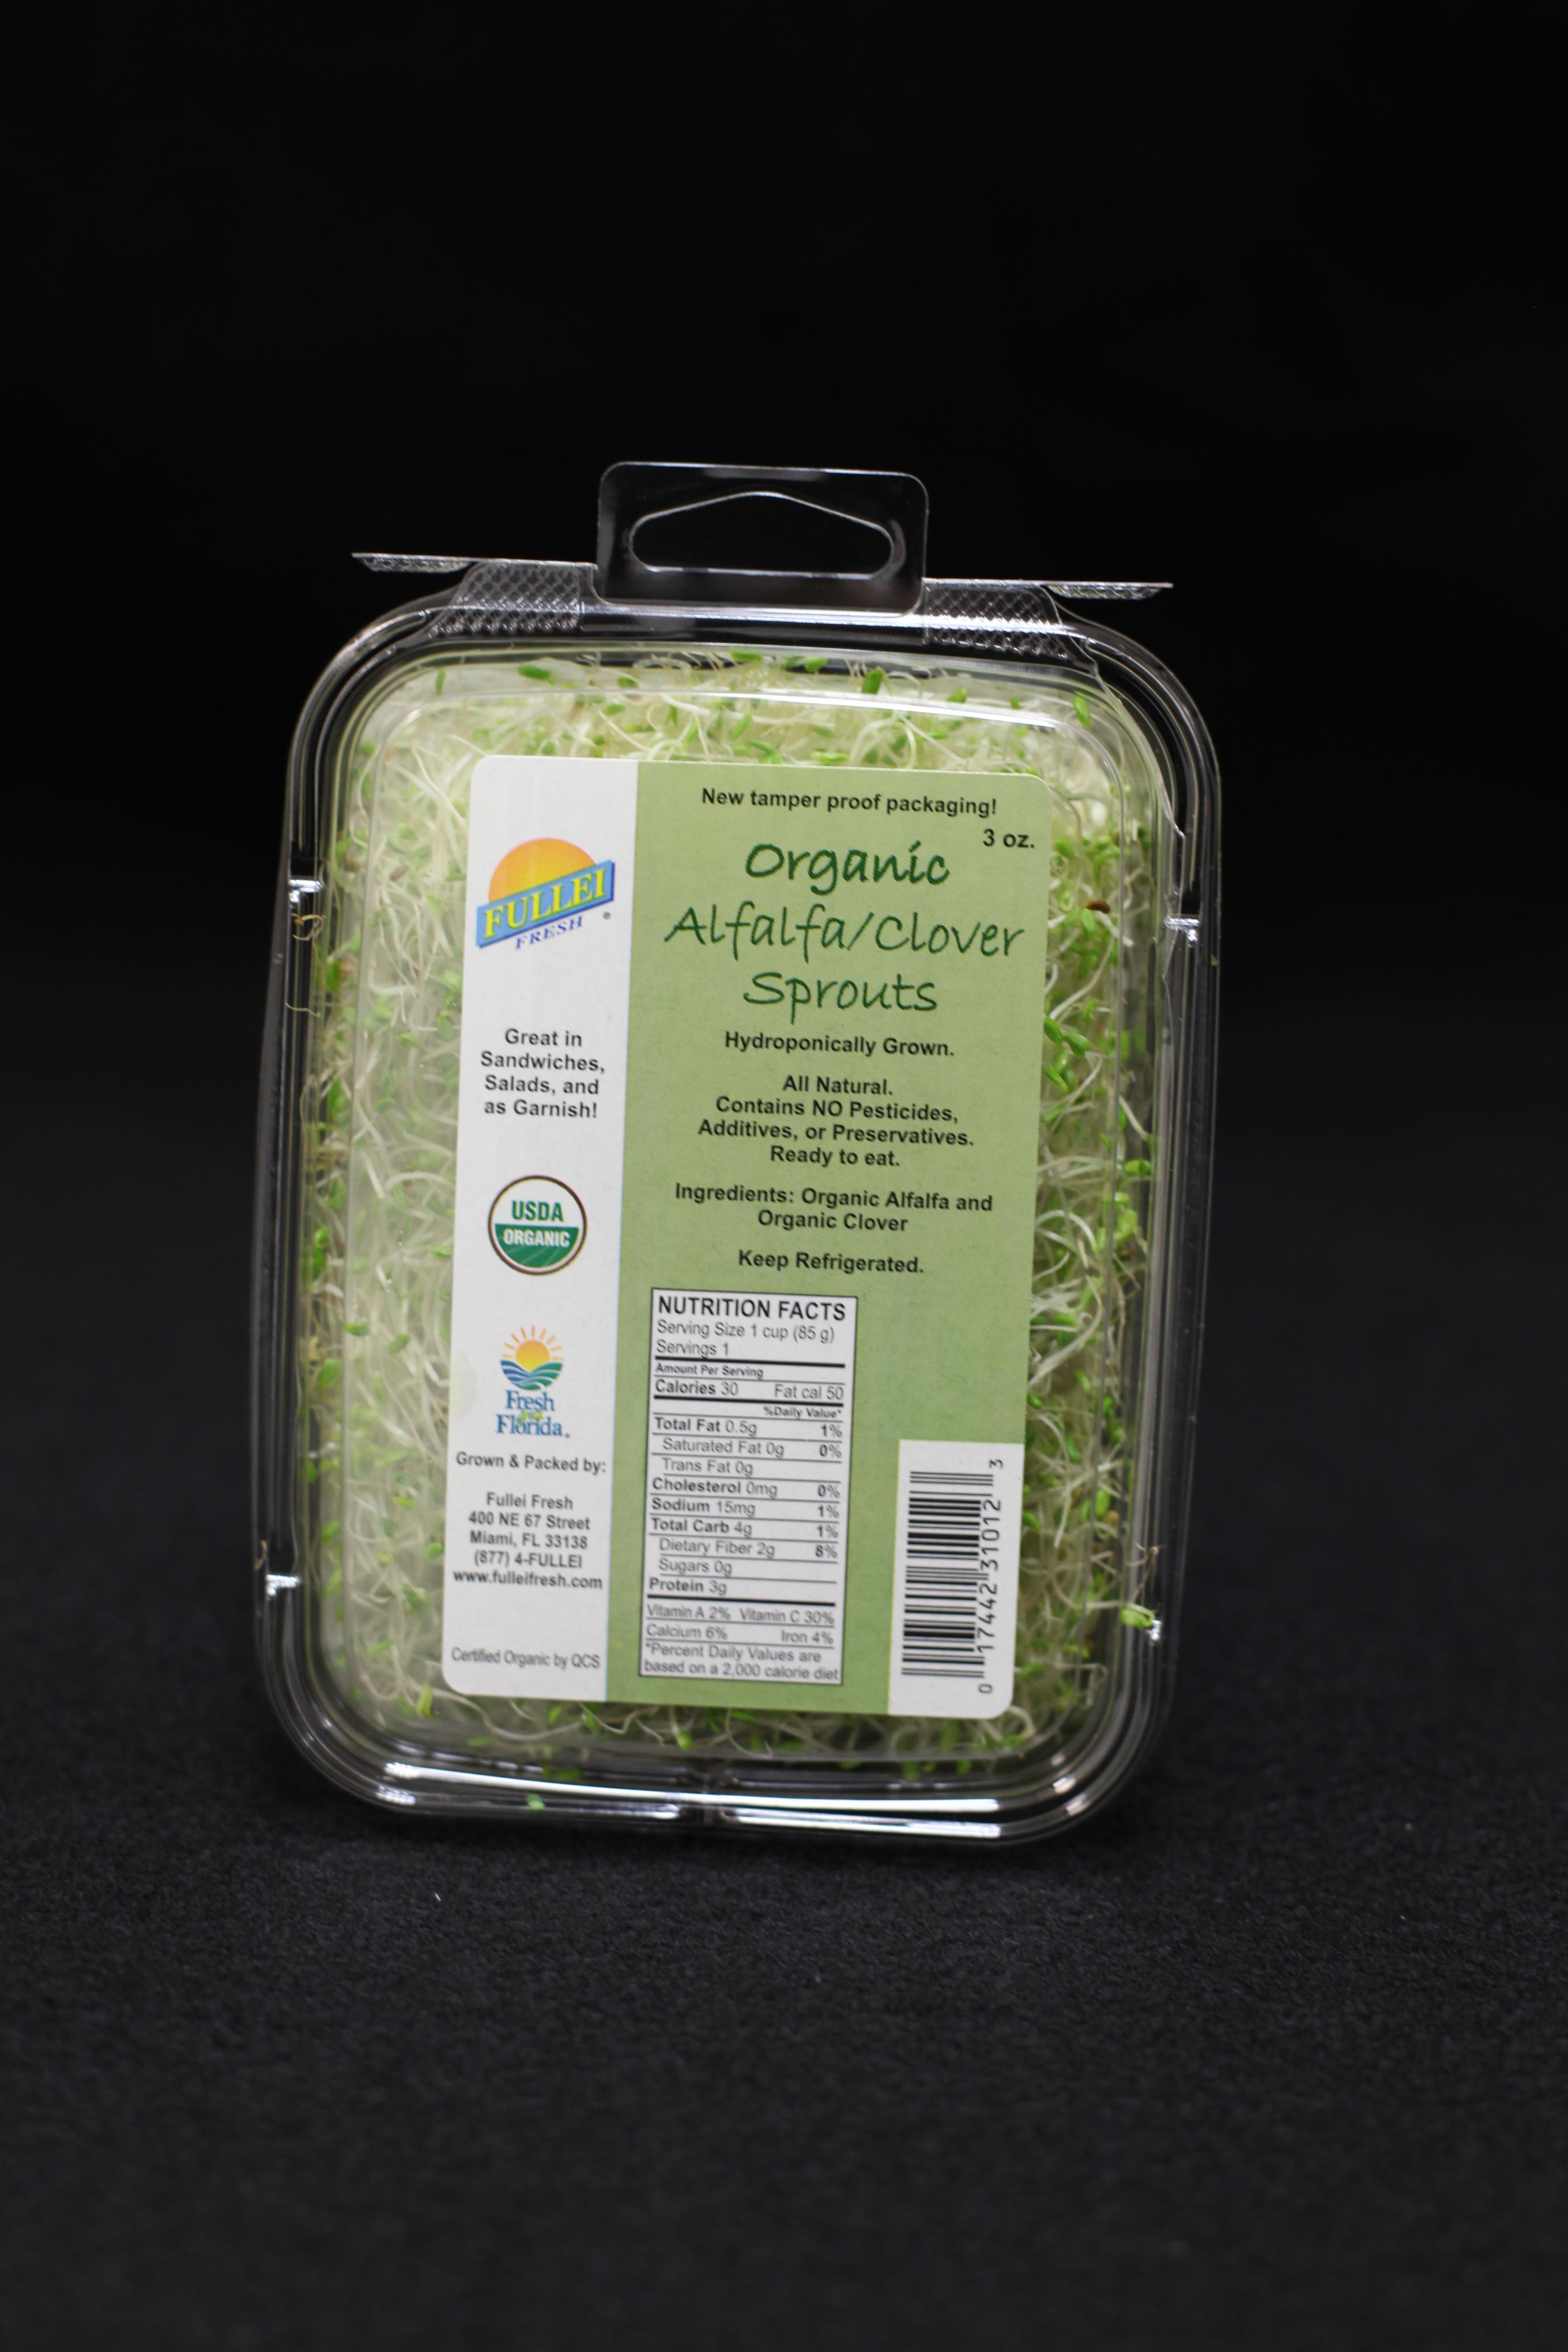 Organic Alfalfa / Clover Sprouts